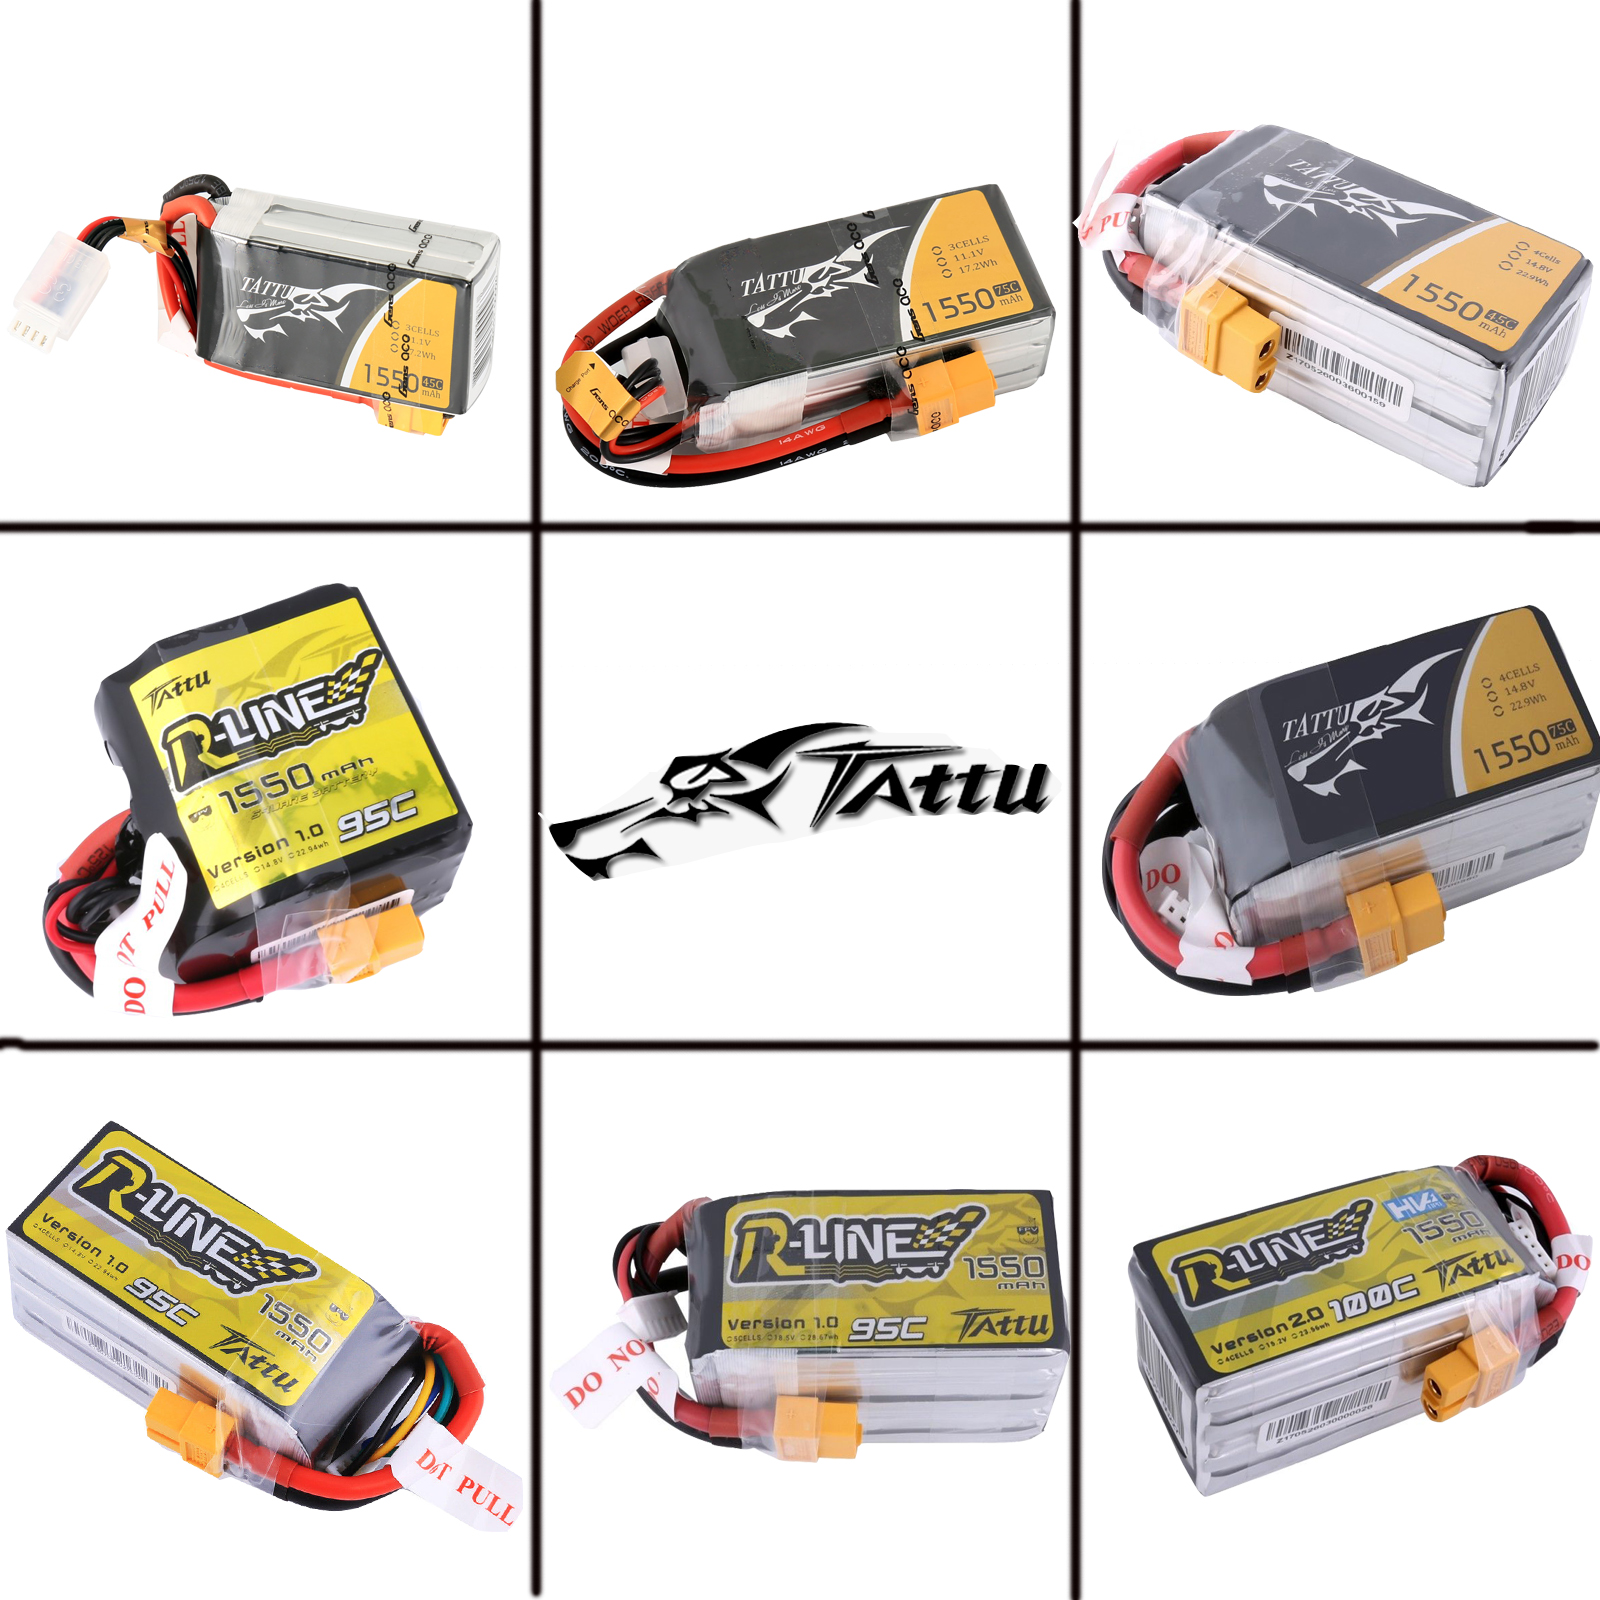 Tattu Rline LiPo Akku Pack 1550mAh 14.8V 95C 4S for FPV Racing Quadcopters Helikopter Flugzeuge und Modellboote